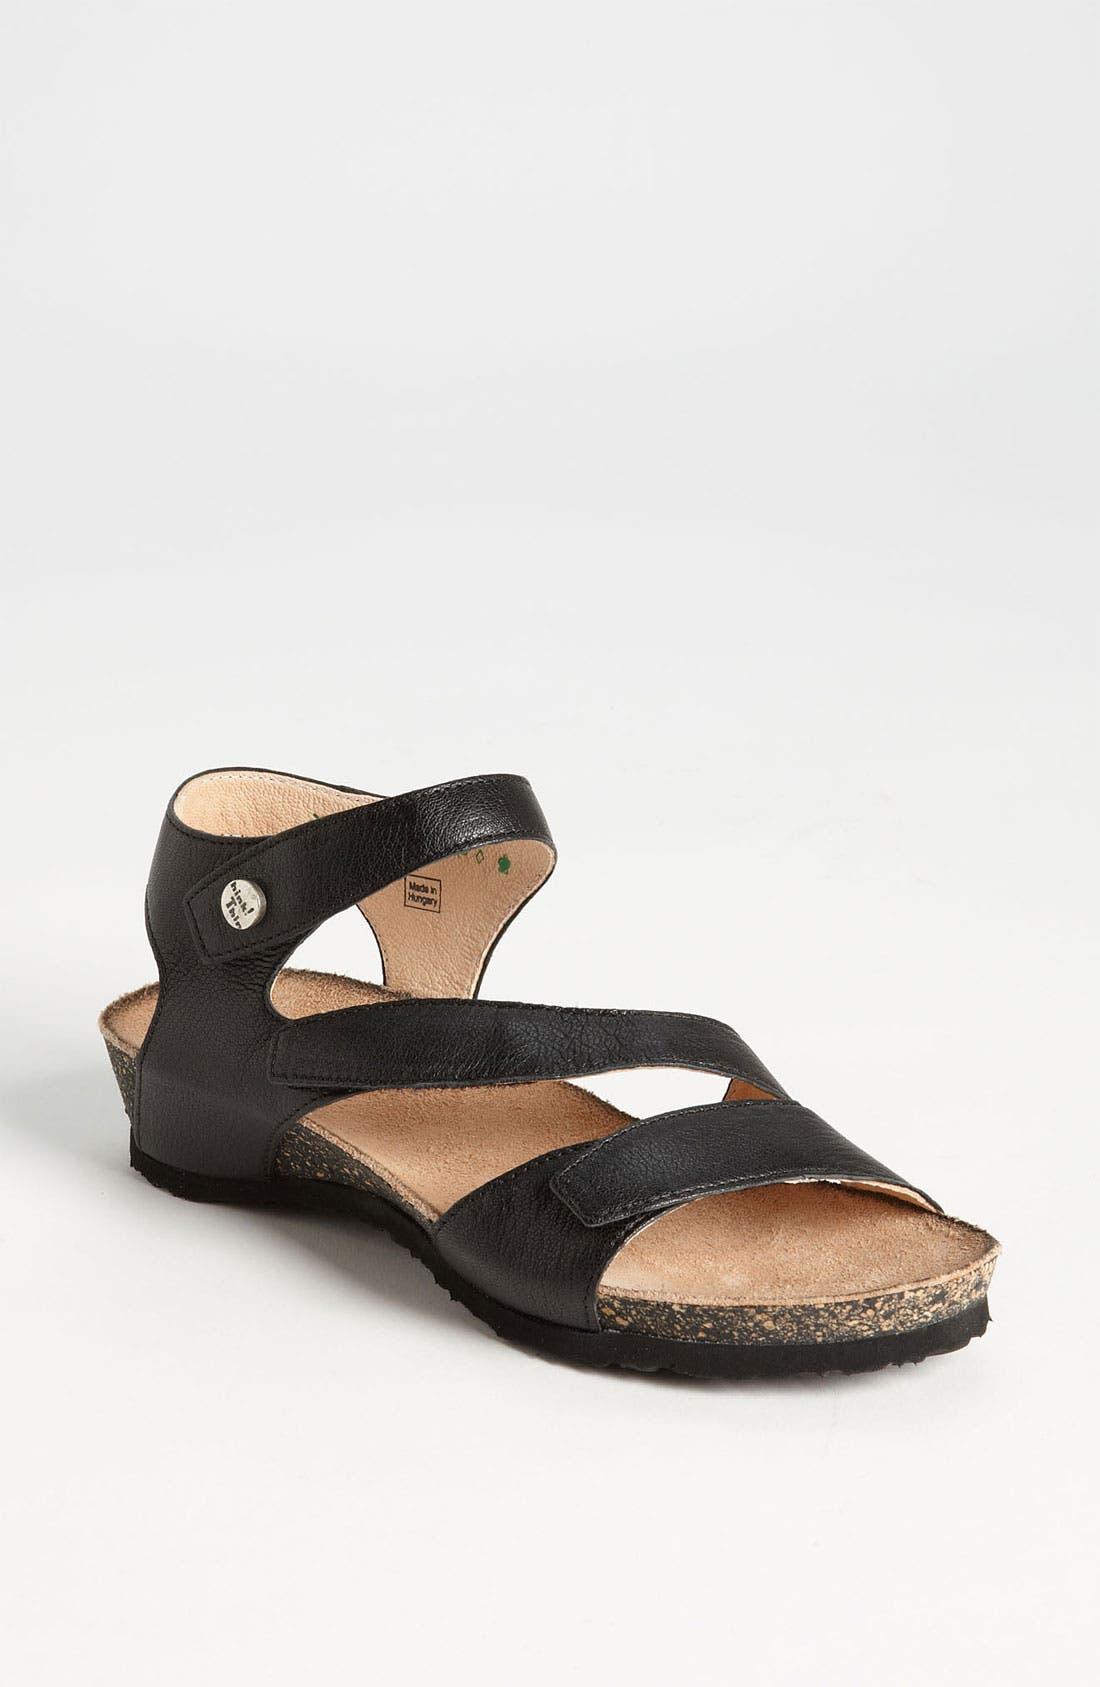 'Dumia' Three Strap Sandal,                             Main thumbnail 1, color,                             001